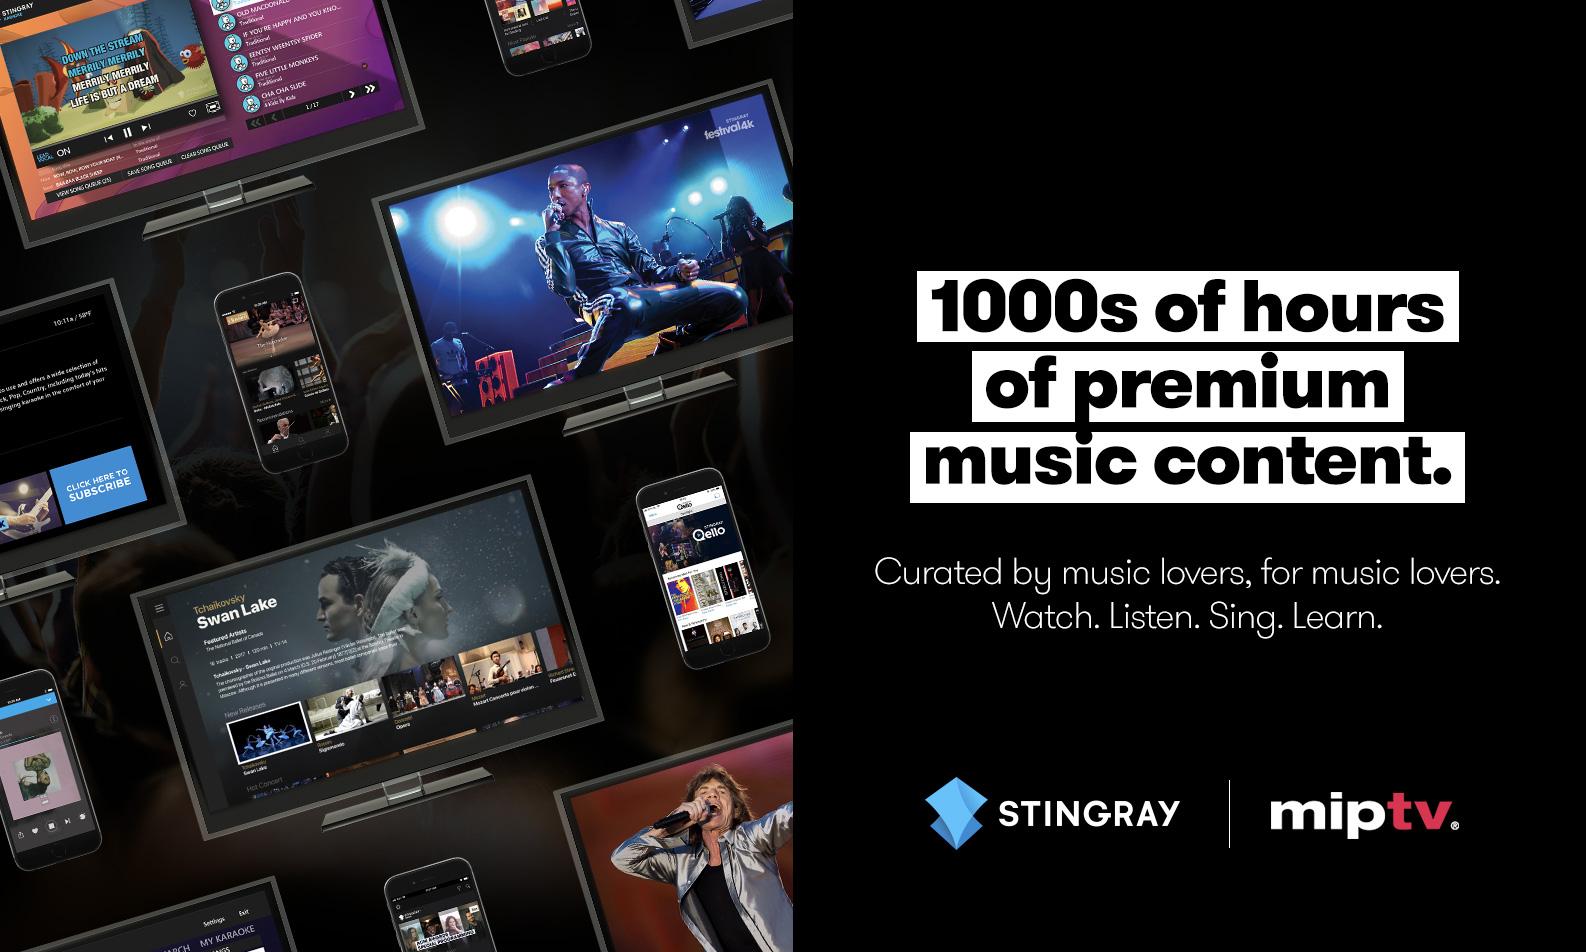 Meet Stingray at MIPTV 2019